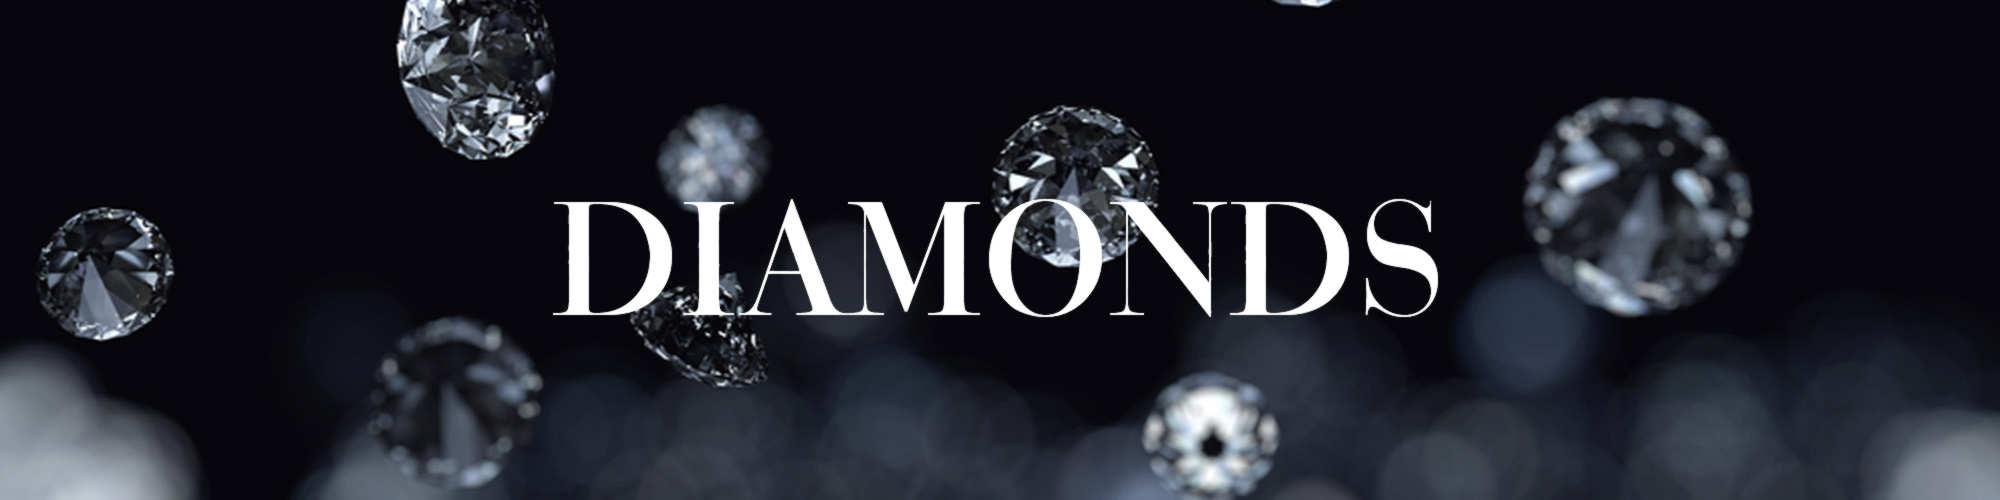 Sell & Buy Diamonds Los Angeles